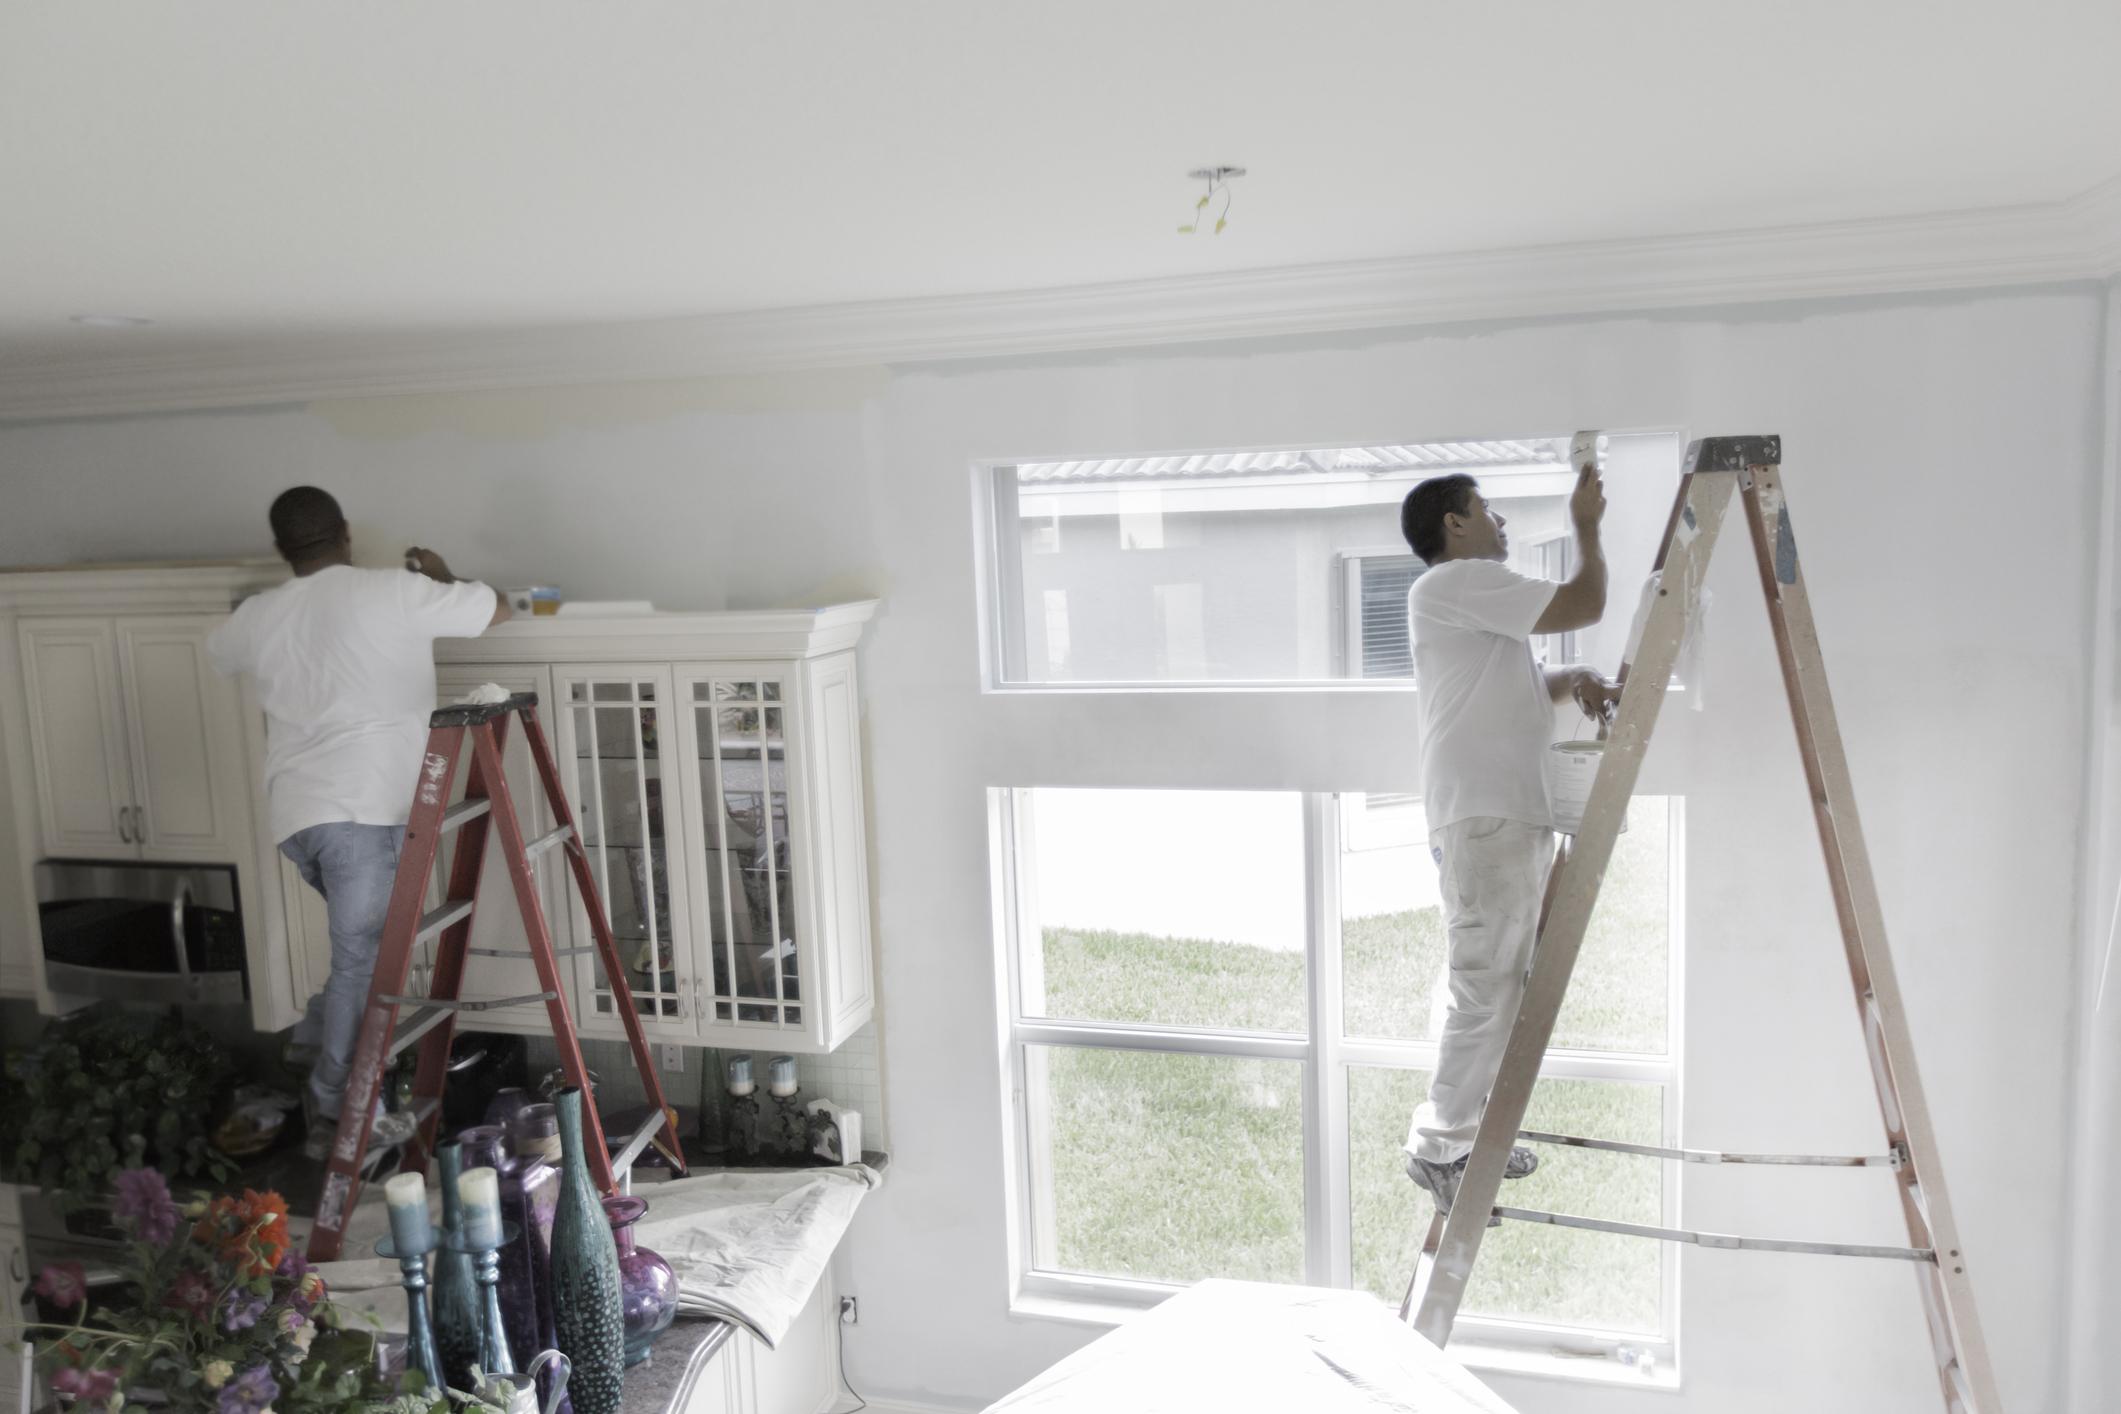 Painting Services Westwood, NJ